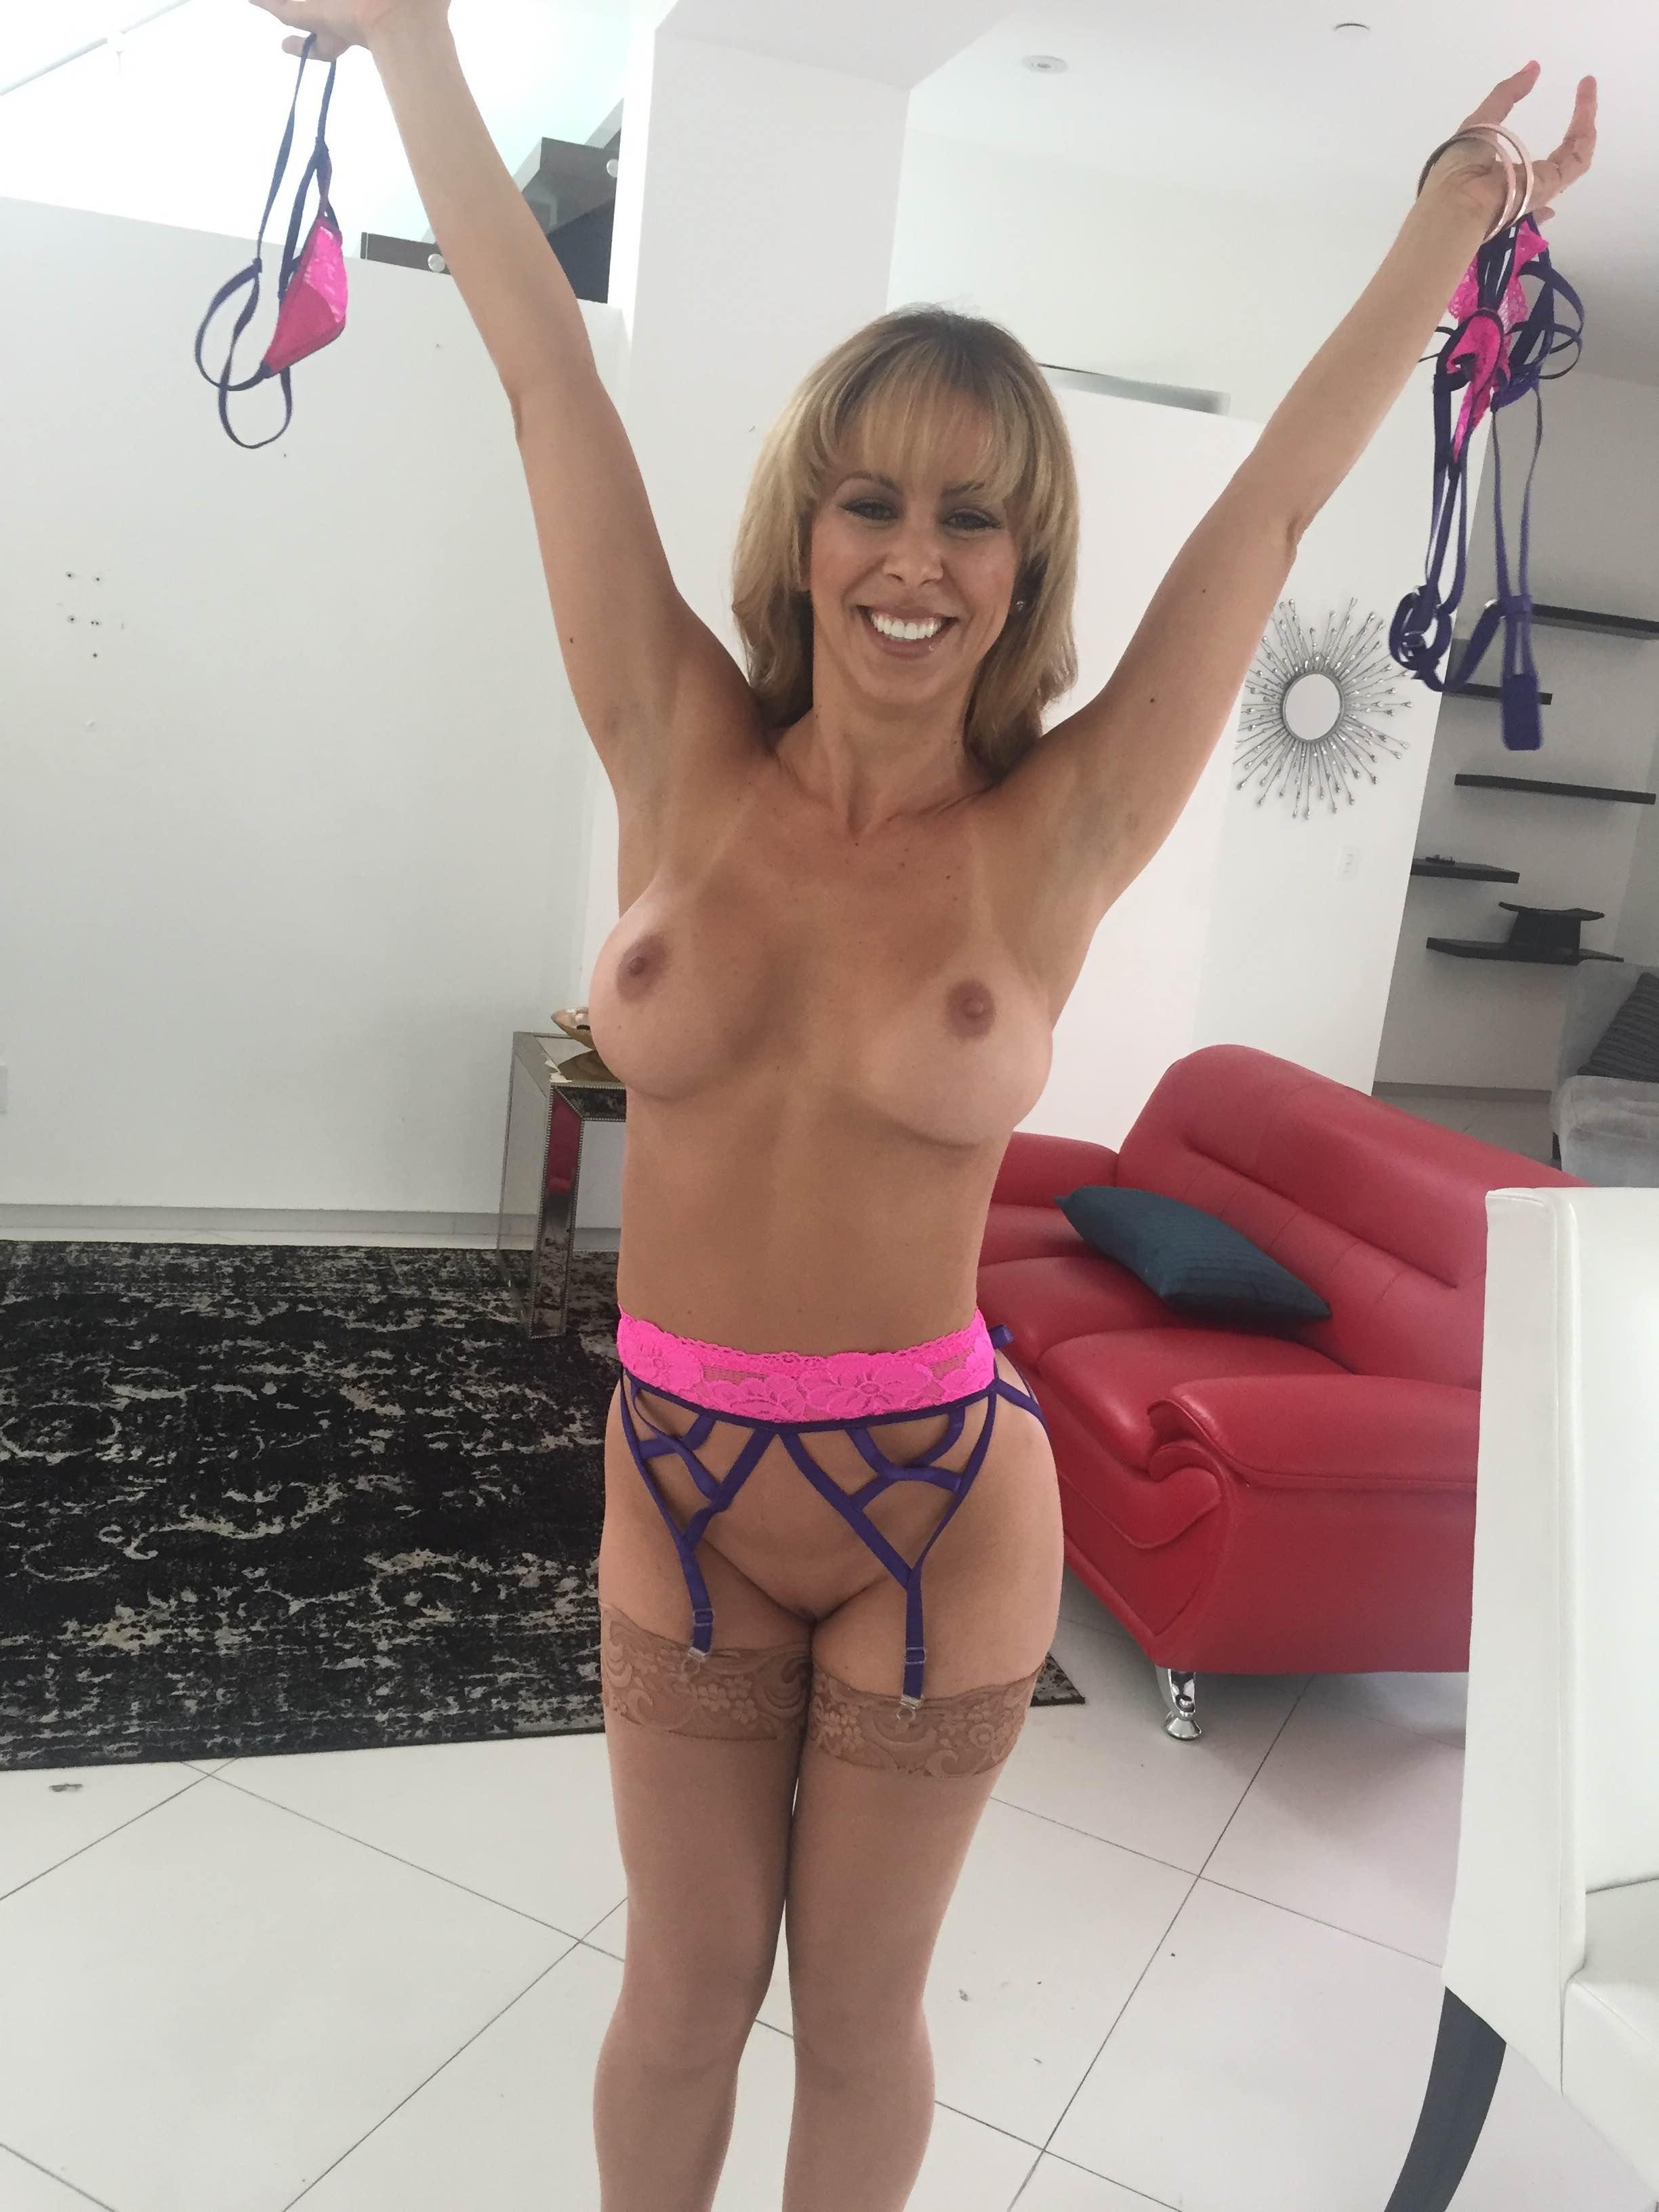 Nikki Brooks B G Porn nude on set with blonde milf porn star cherie deville and